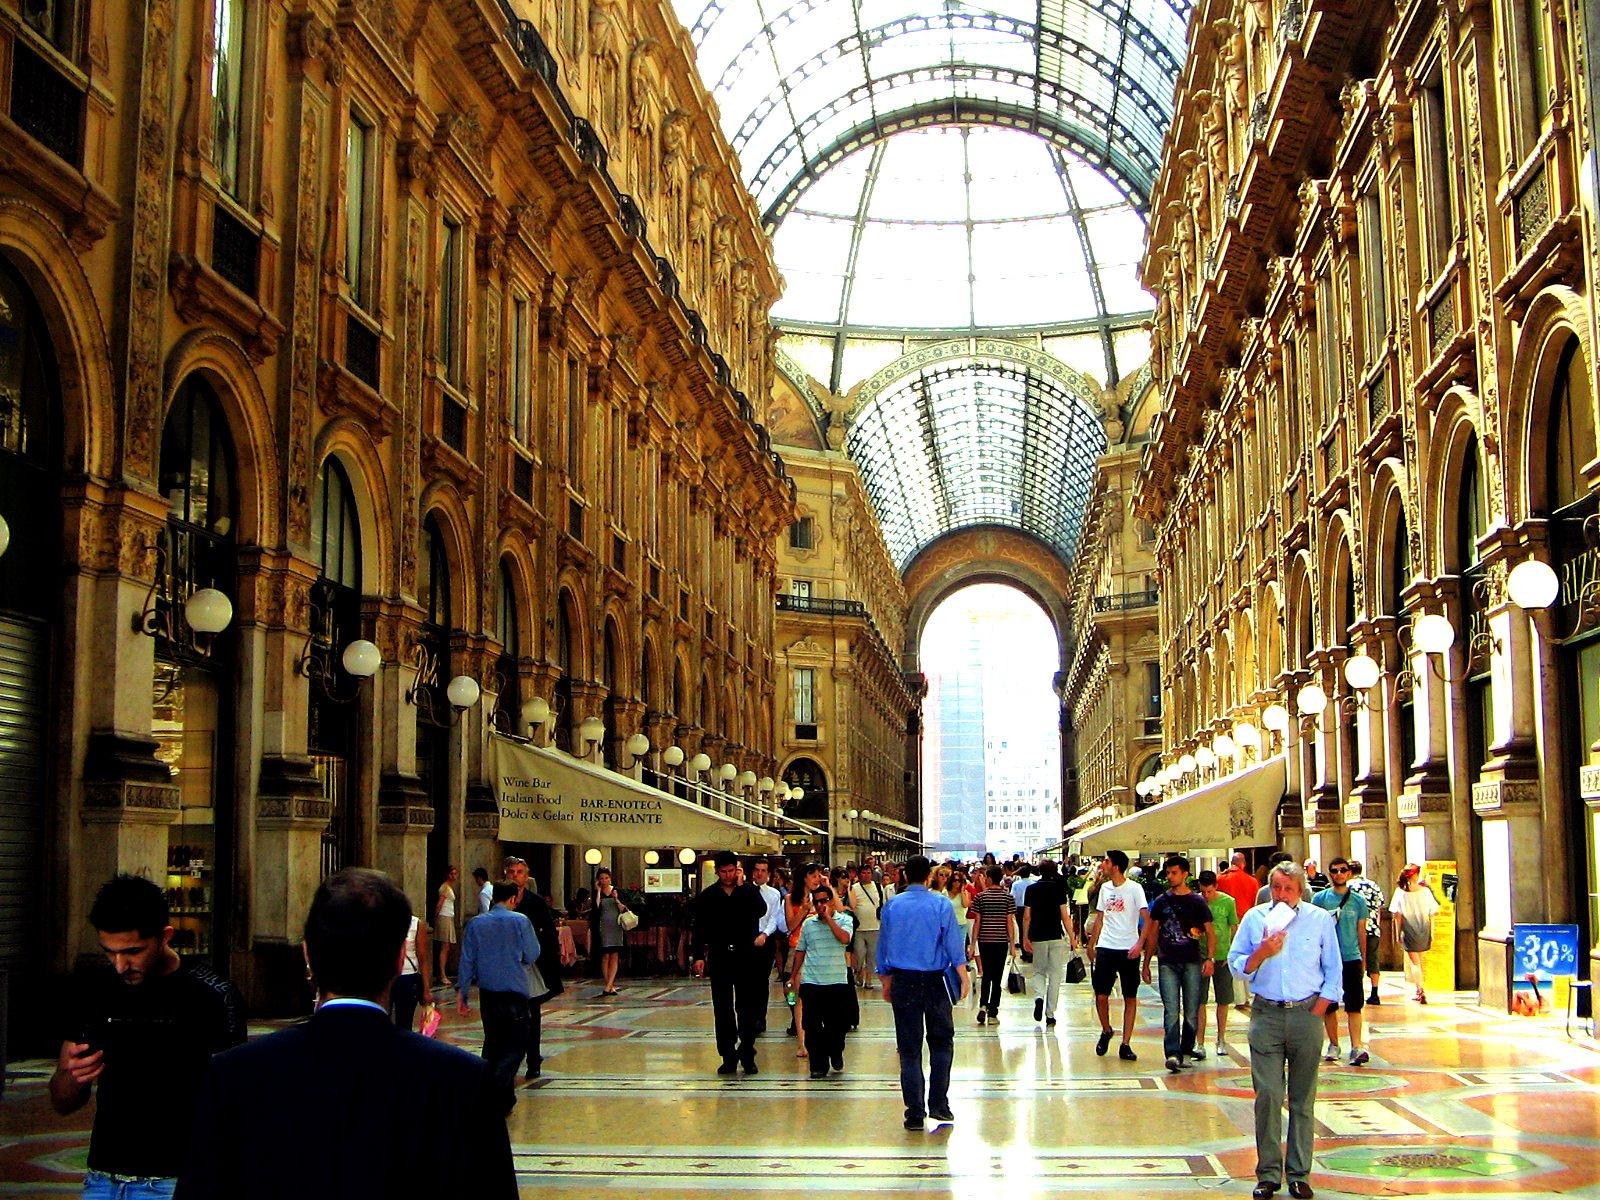 Free Milan, Galleria Vittorio Emanuele II Stock Photo ...